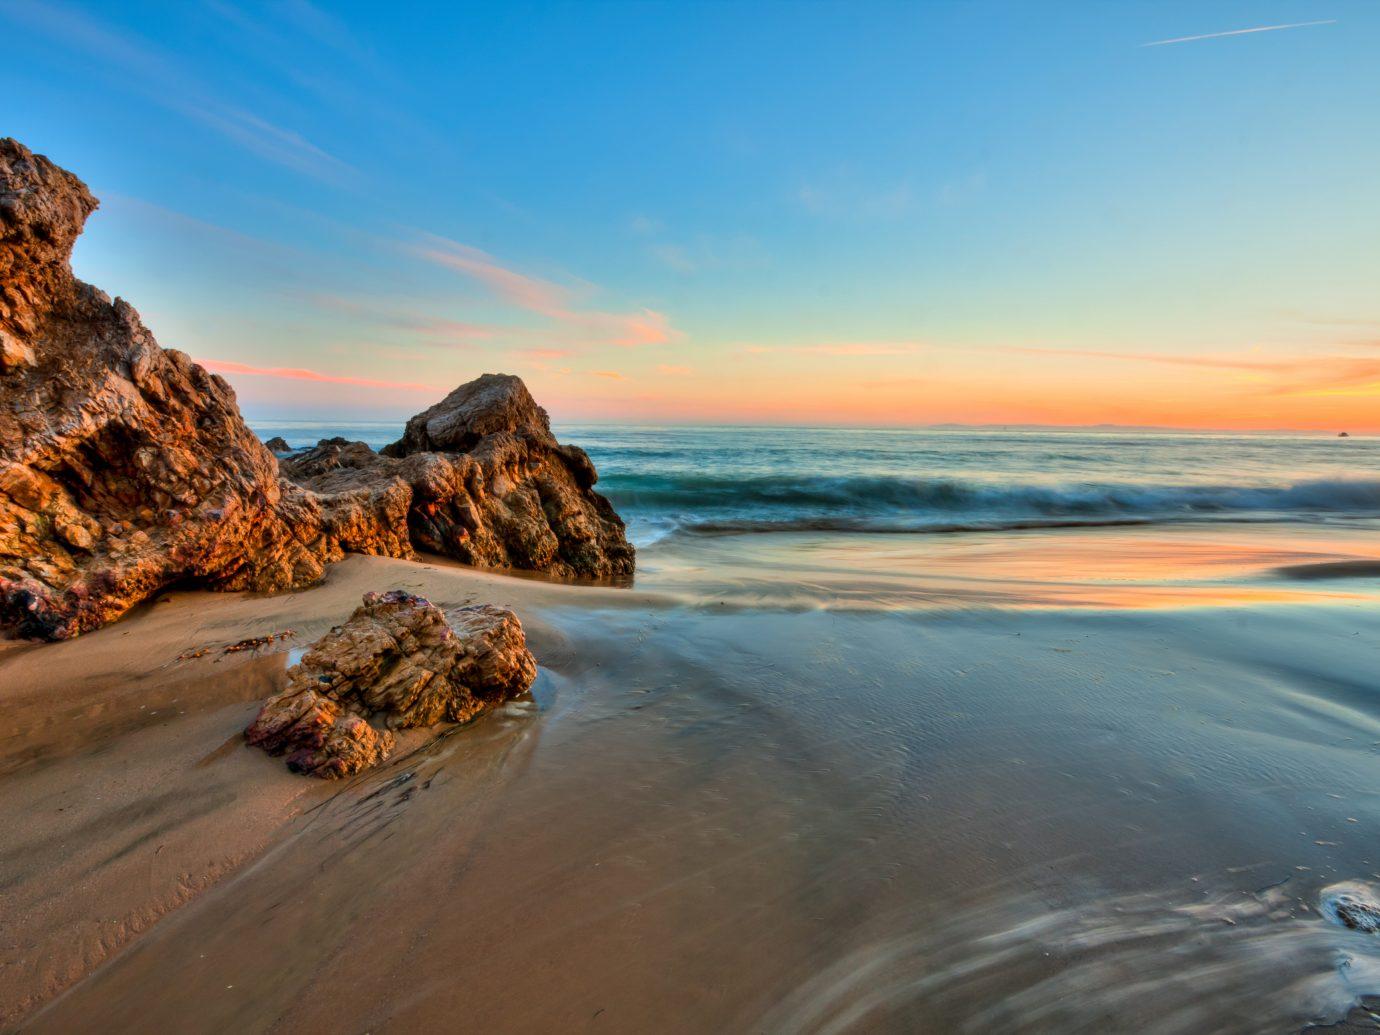 Seal Beach at sunset